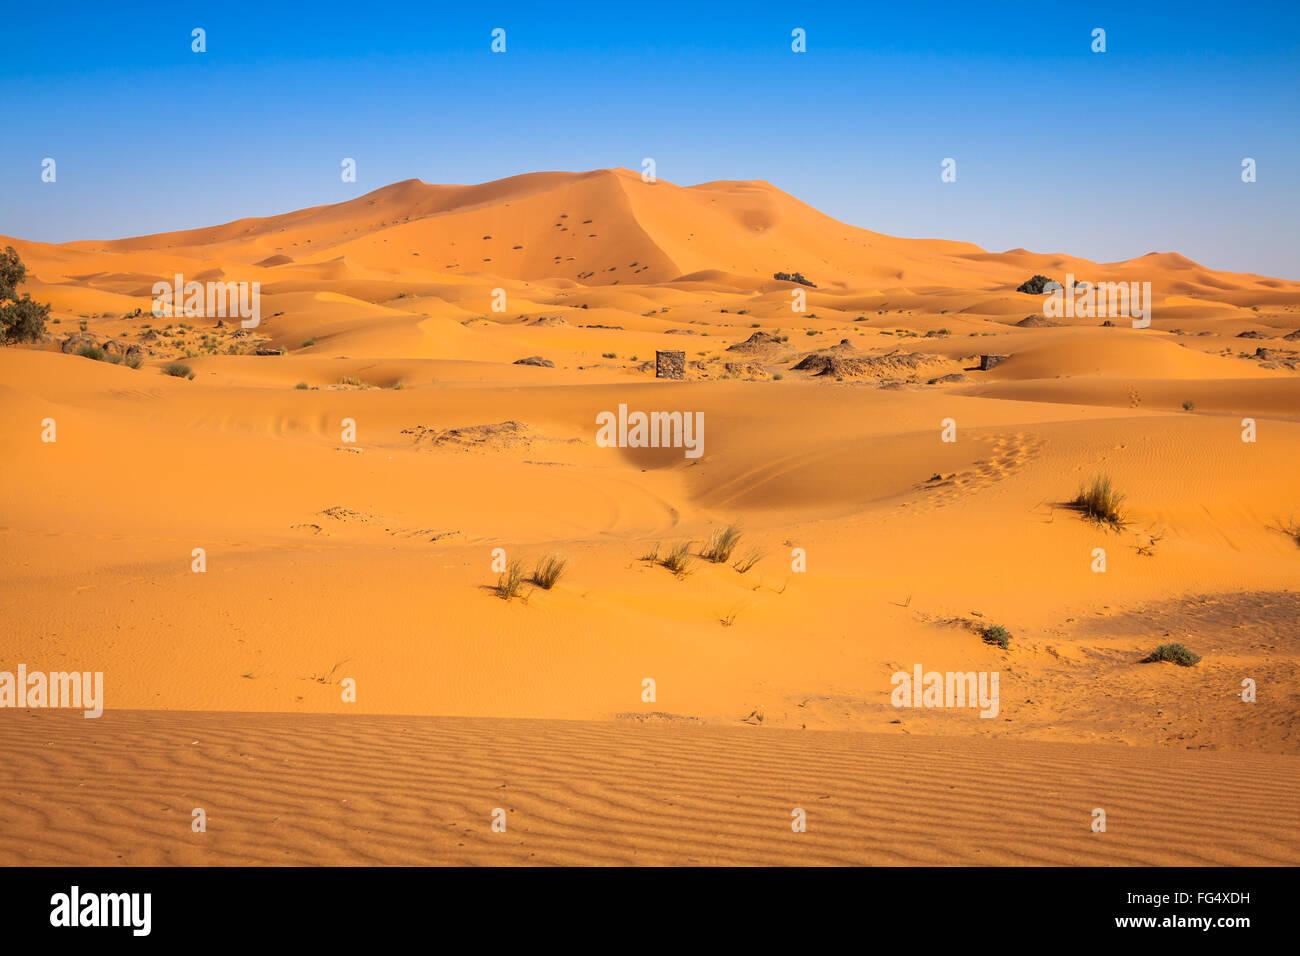 The seas of dunes of Erg Chebbi near Merzouga in southeastern Morocco. - Stock Image